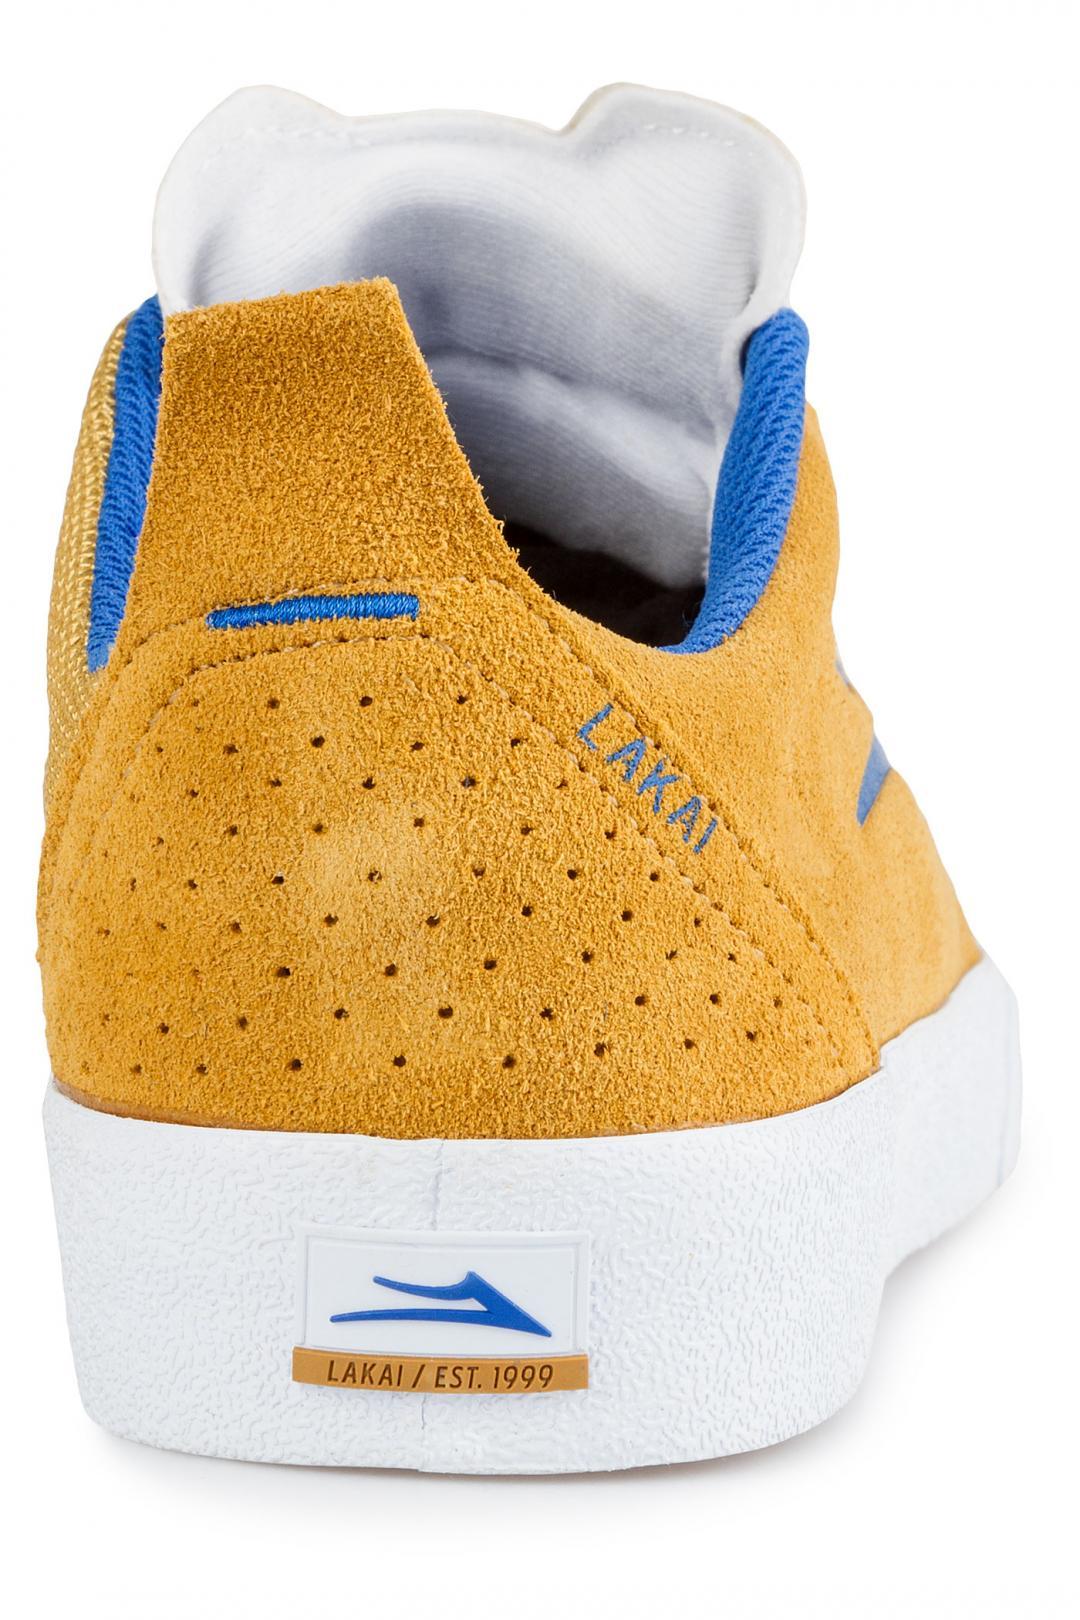 Uomo Lakai Bristol Suede gold blue | Sneakers low top